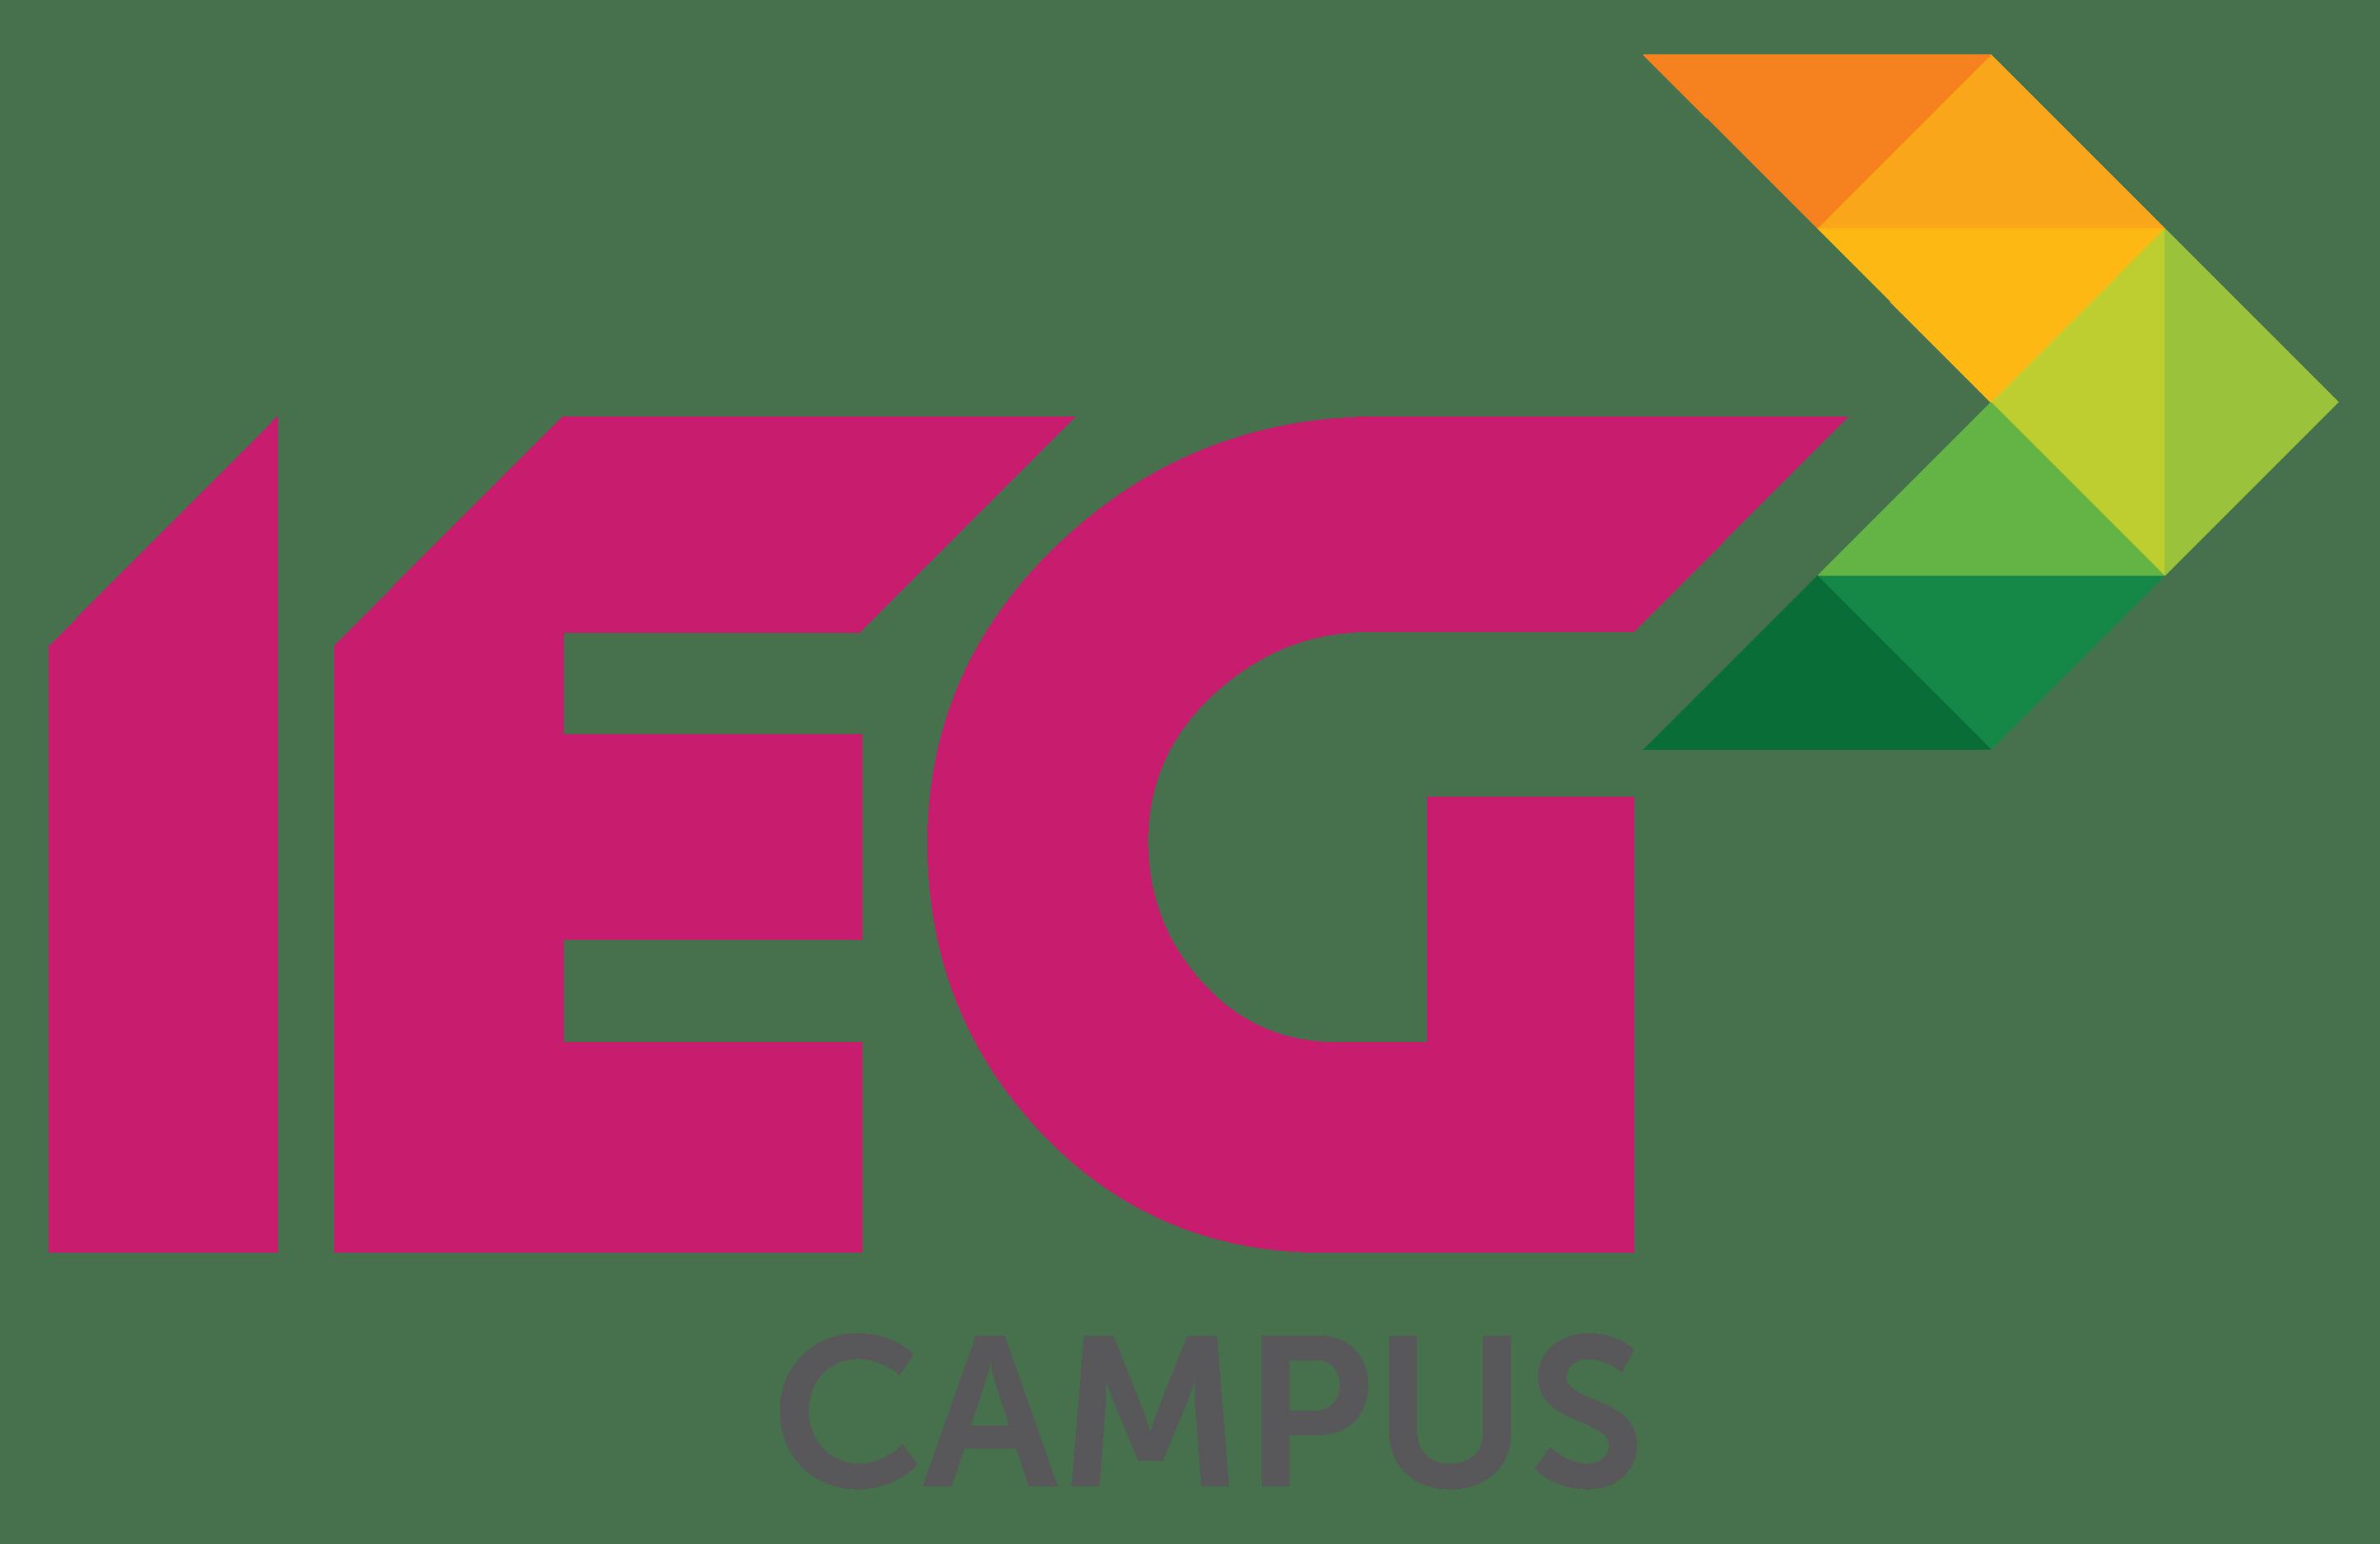 IEG Campus